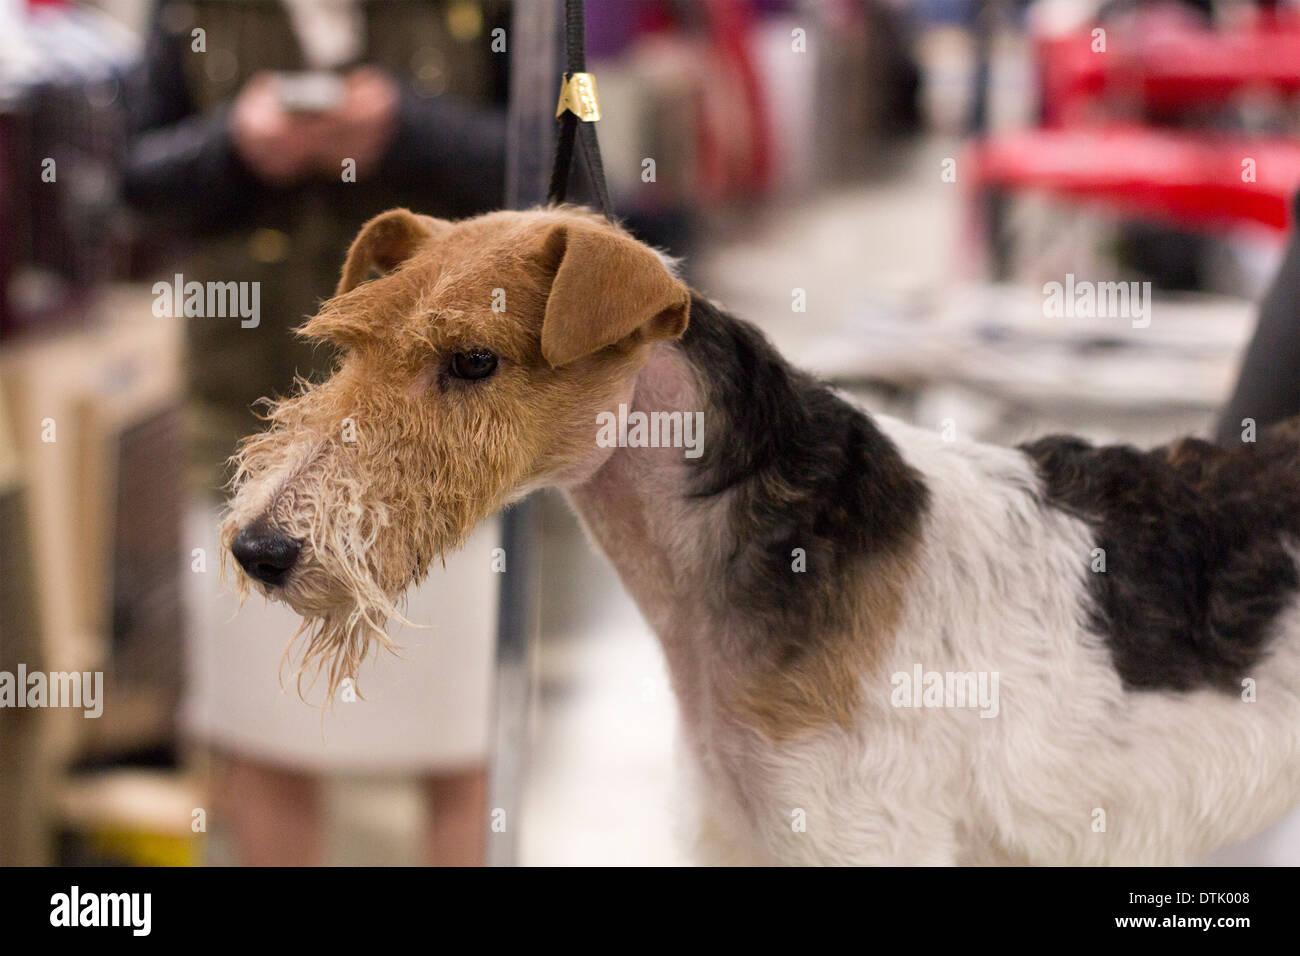 Grooming Table Canine Stockfotos & Grooming Table Canine Bilder - Alamy